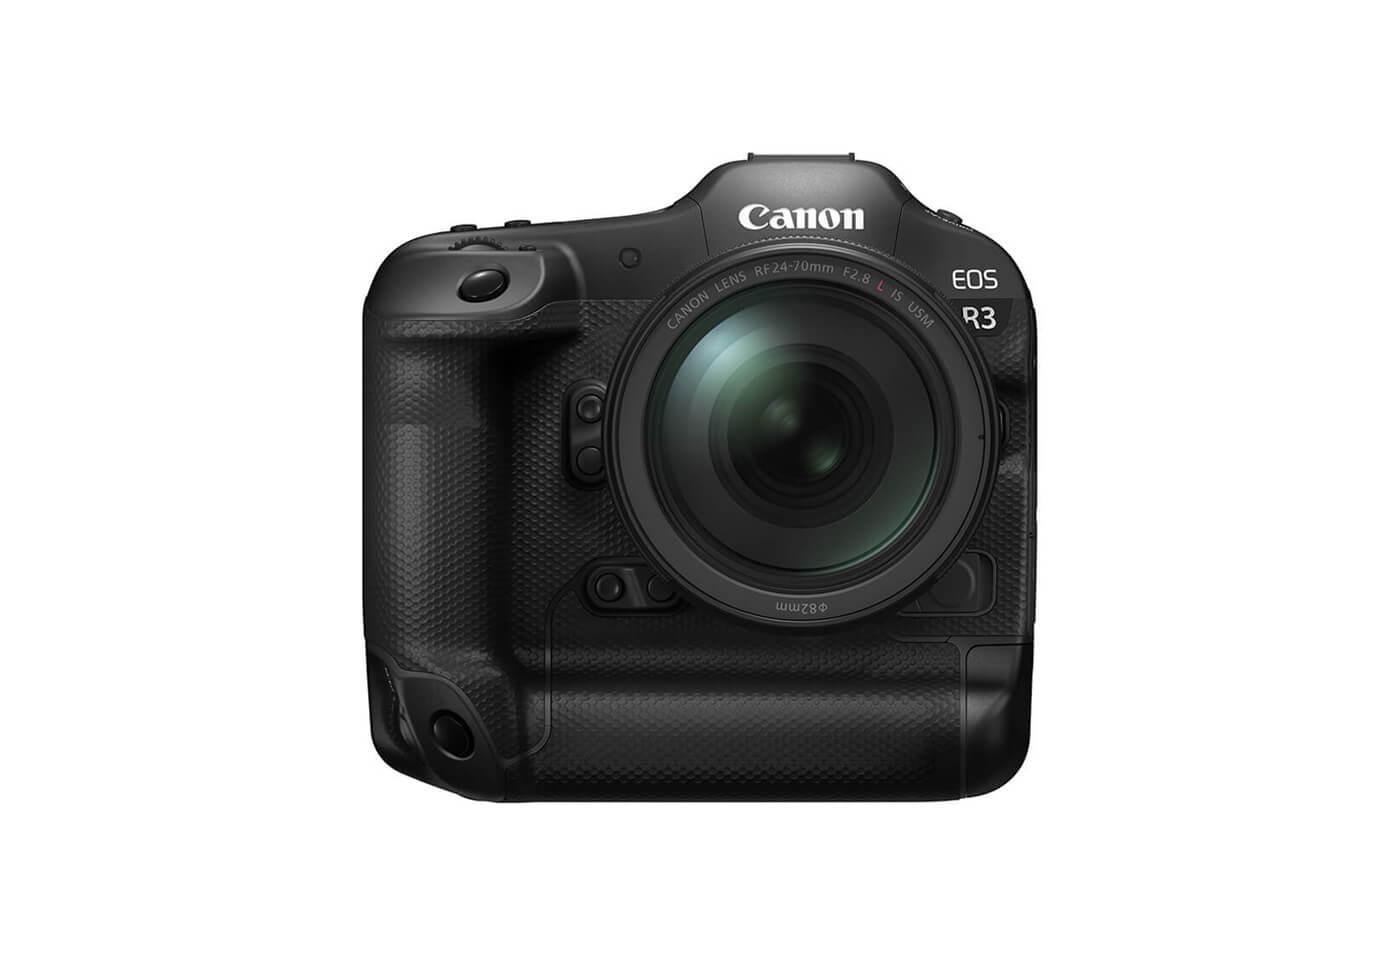 www.canon.com.au